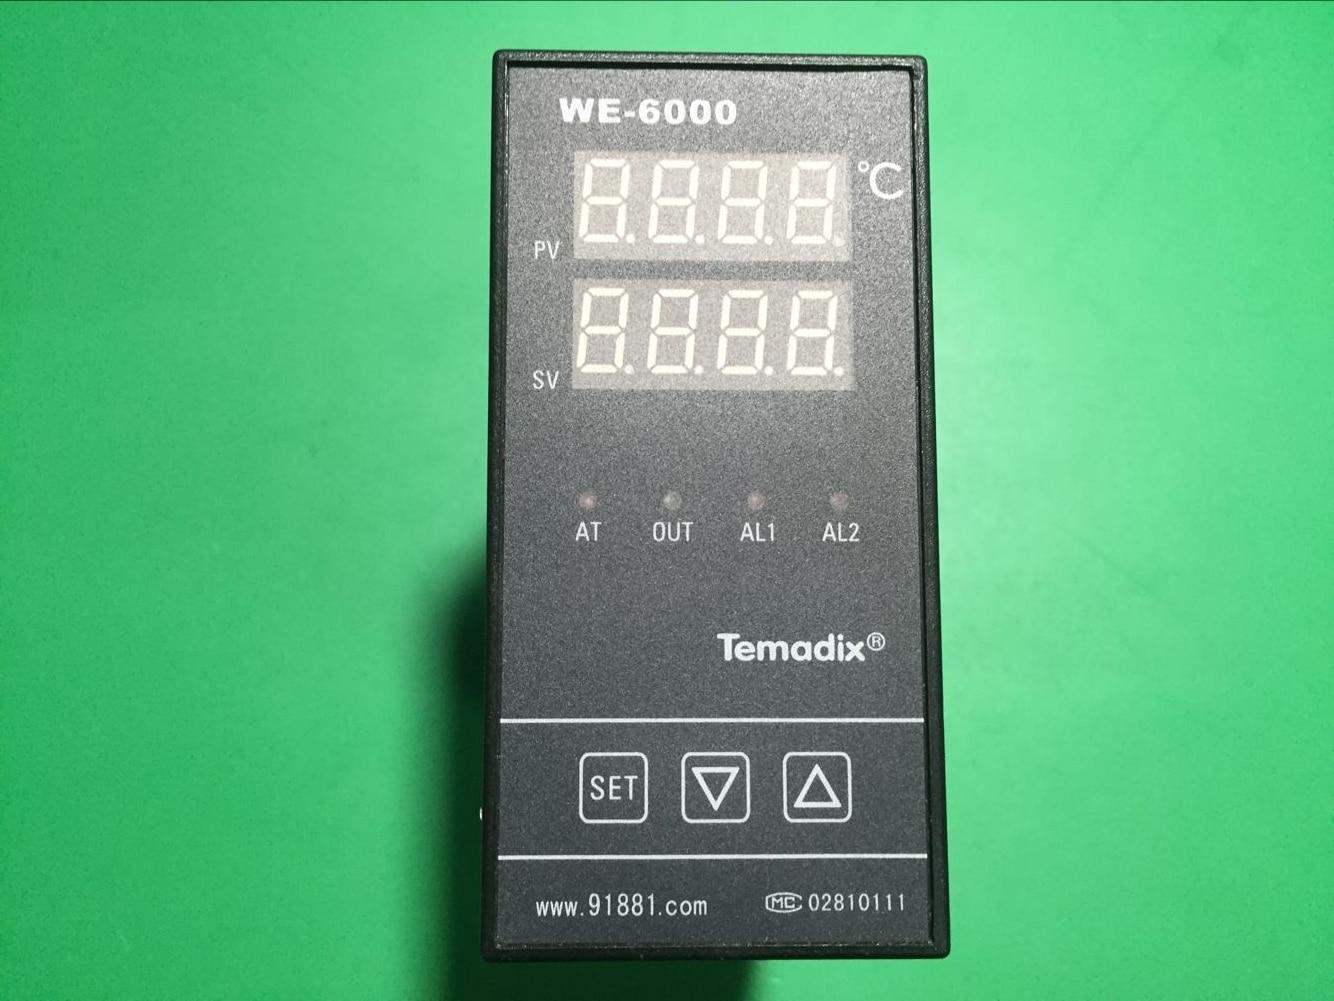 Temadix يوياو مقياس الحرارة مصنع WE-6002 5012 5411 شحن مجاني بقعة WE-5000 0-200 درجة